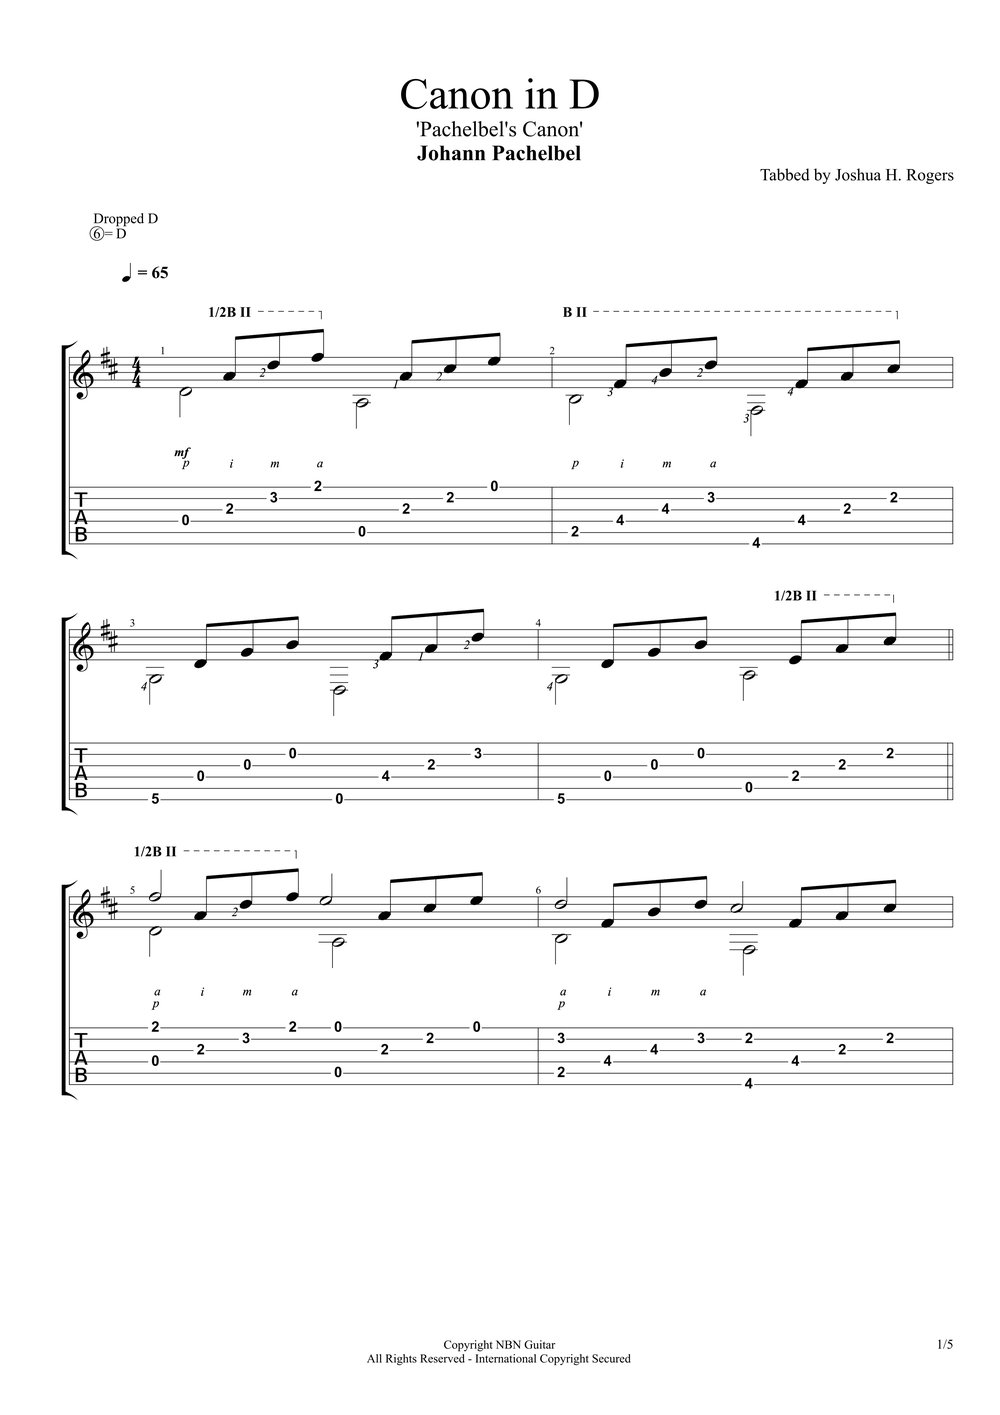 Pachelbel's Canon in D (Sheet Music & Tabs)-p3.jpg